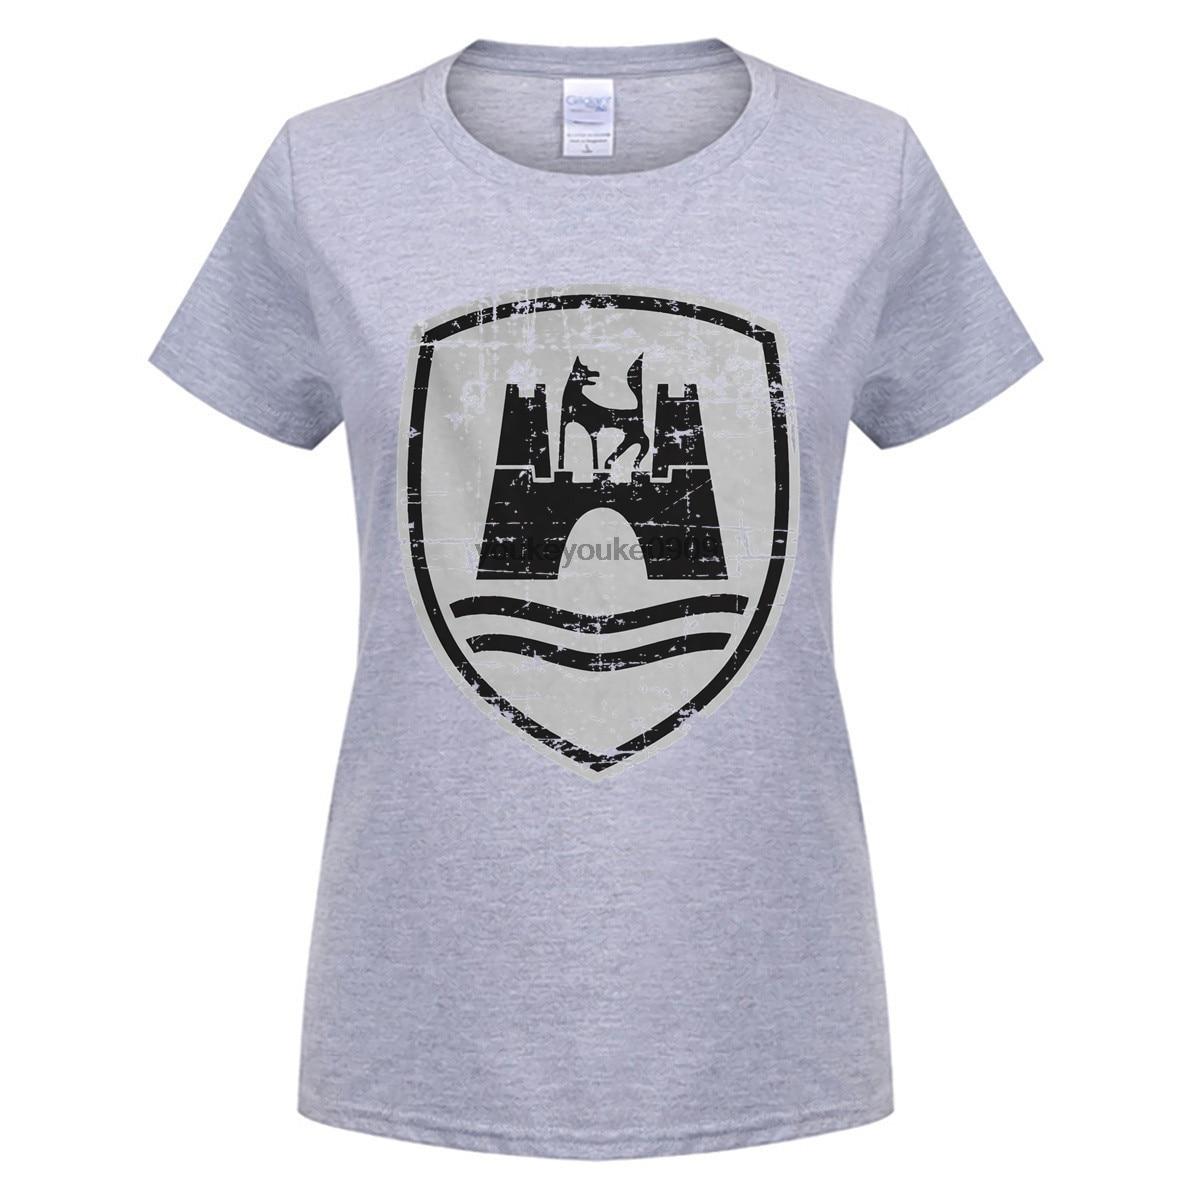 GILDAN Classico Di Wolfsburg, Uomo Campervan T-shirt Cotton T-Shirt Fashion T Shirt Free Shipping Animal Loose Clothes